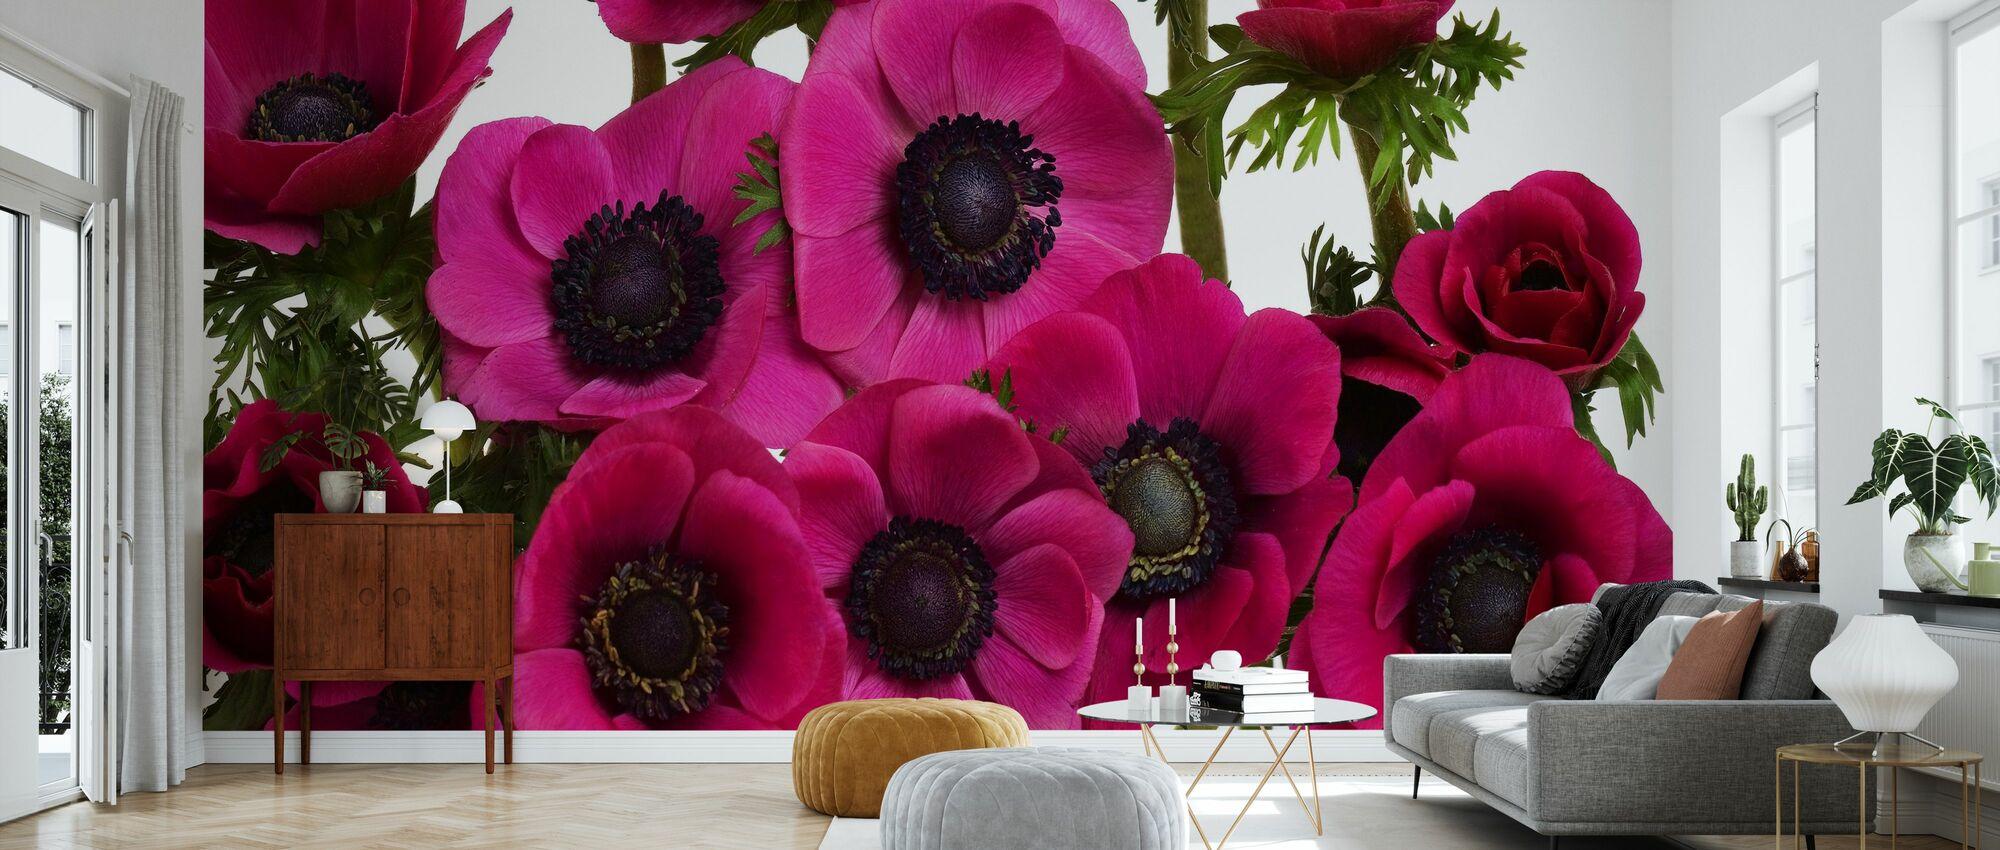 Panoramic Flowers - Pink - Wallpaper - Living Room